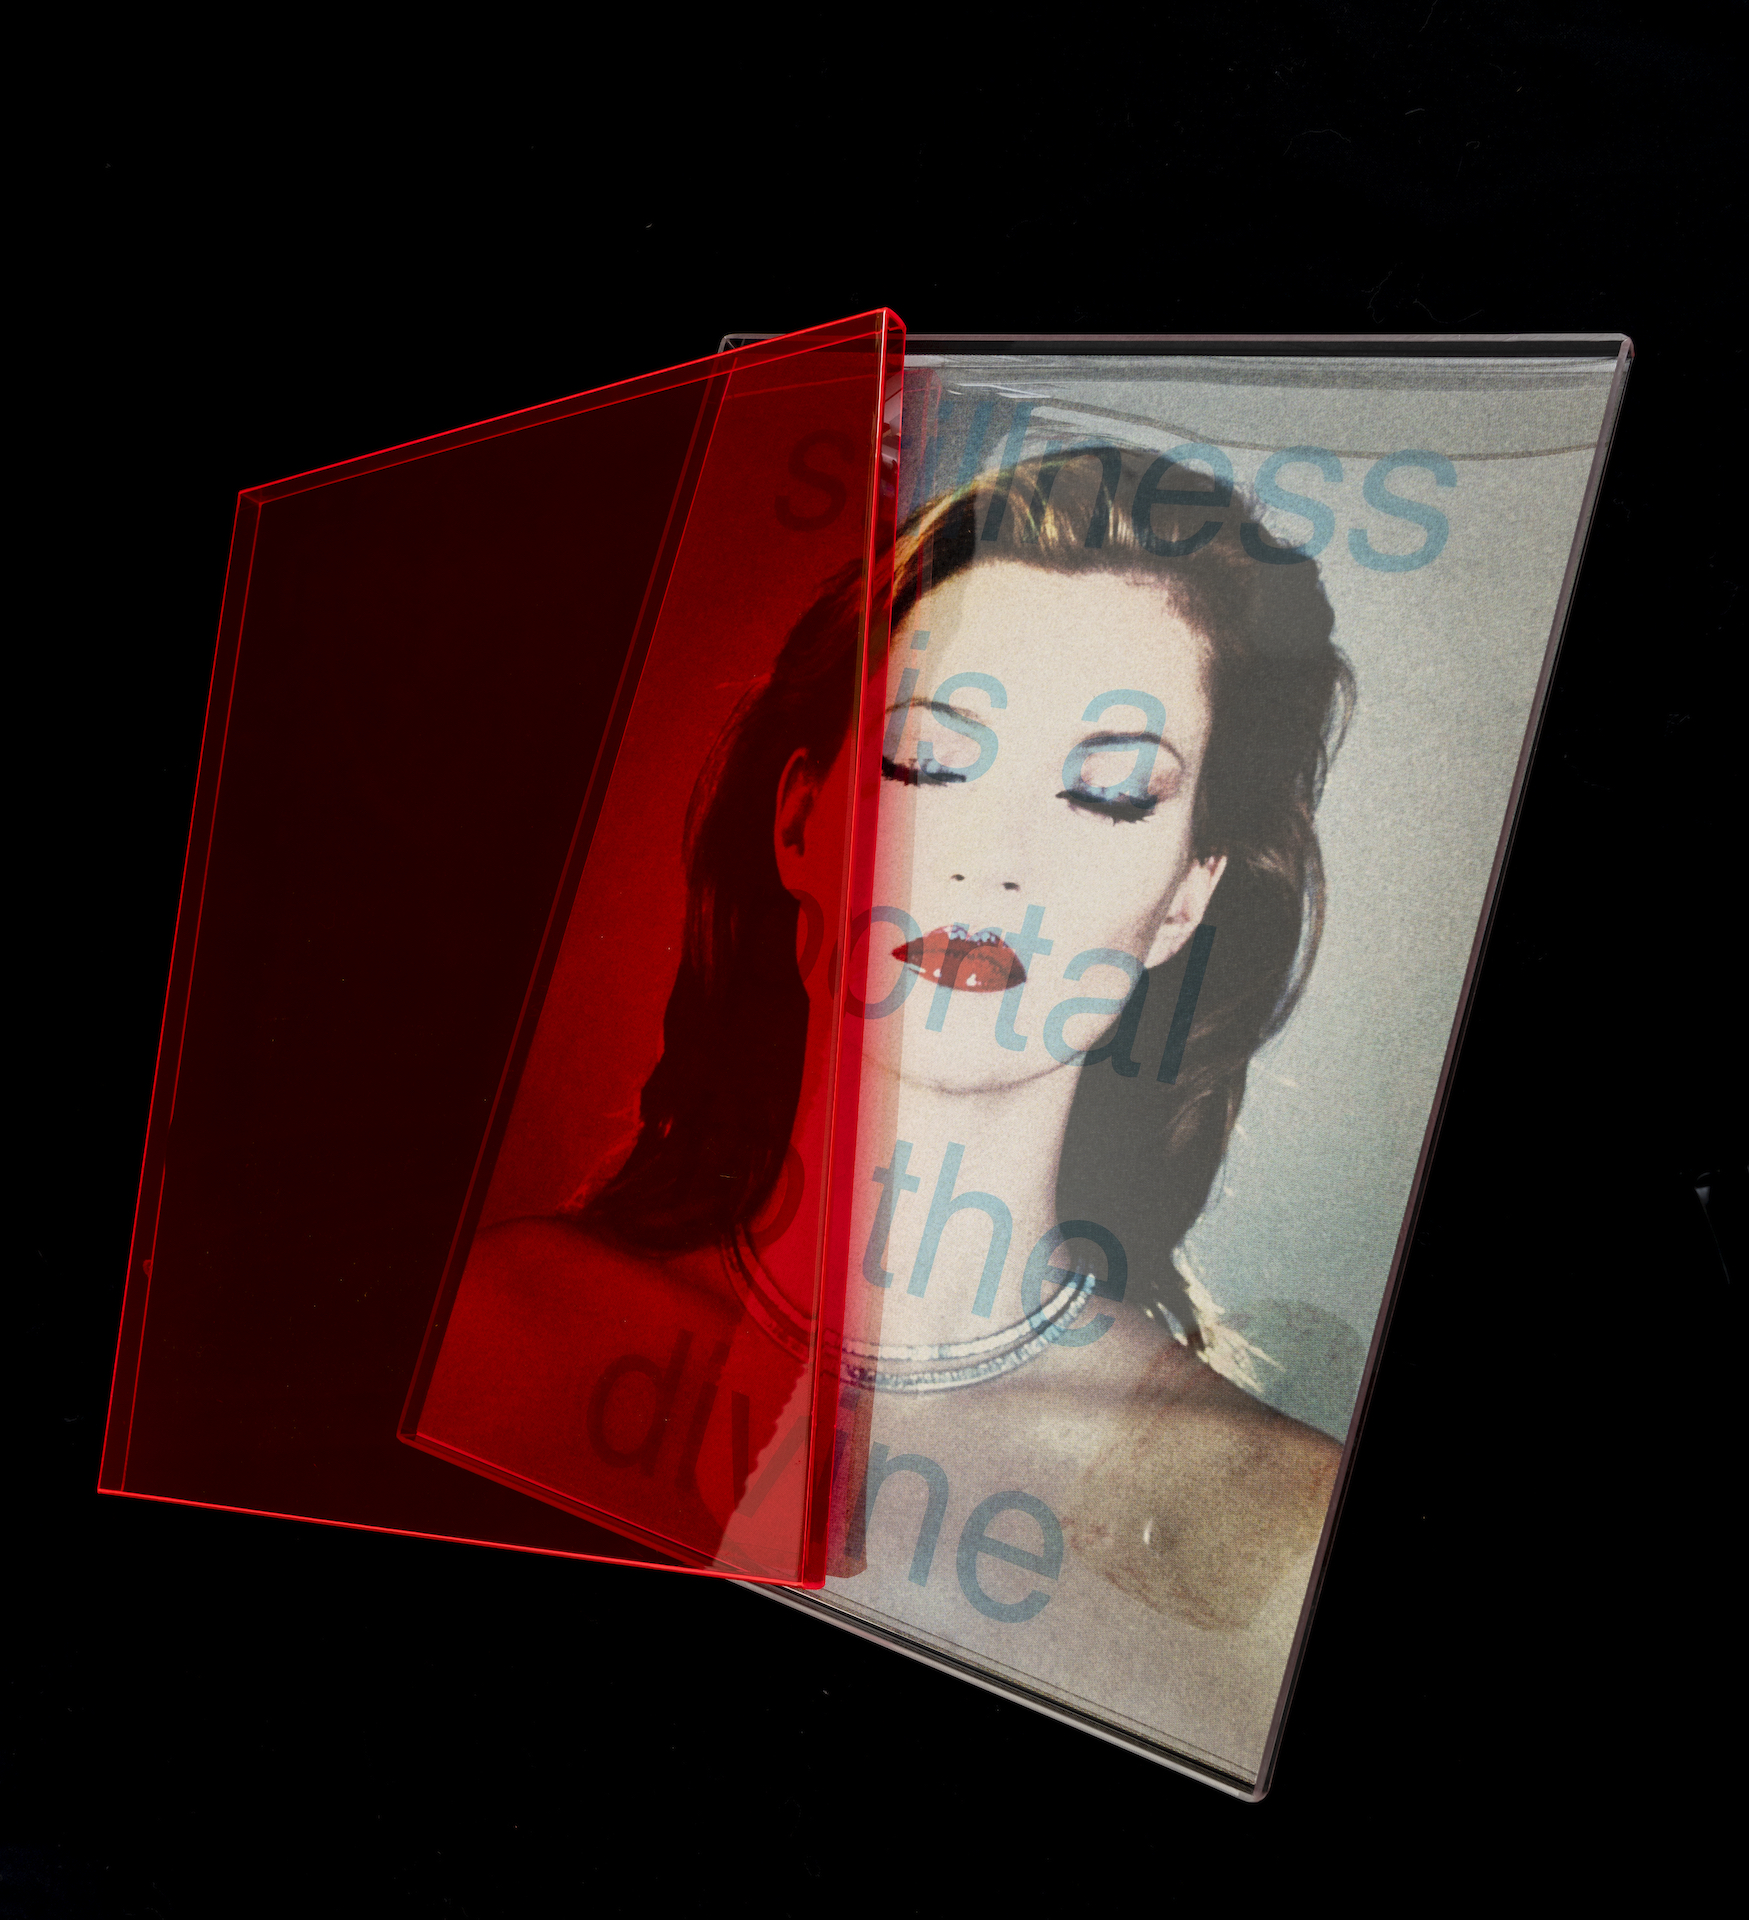 Chris Levine (British 1960-), 'Stillness Is A Portal To The Devine', 2021 - Image 2 of 3